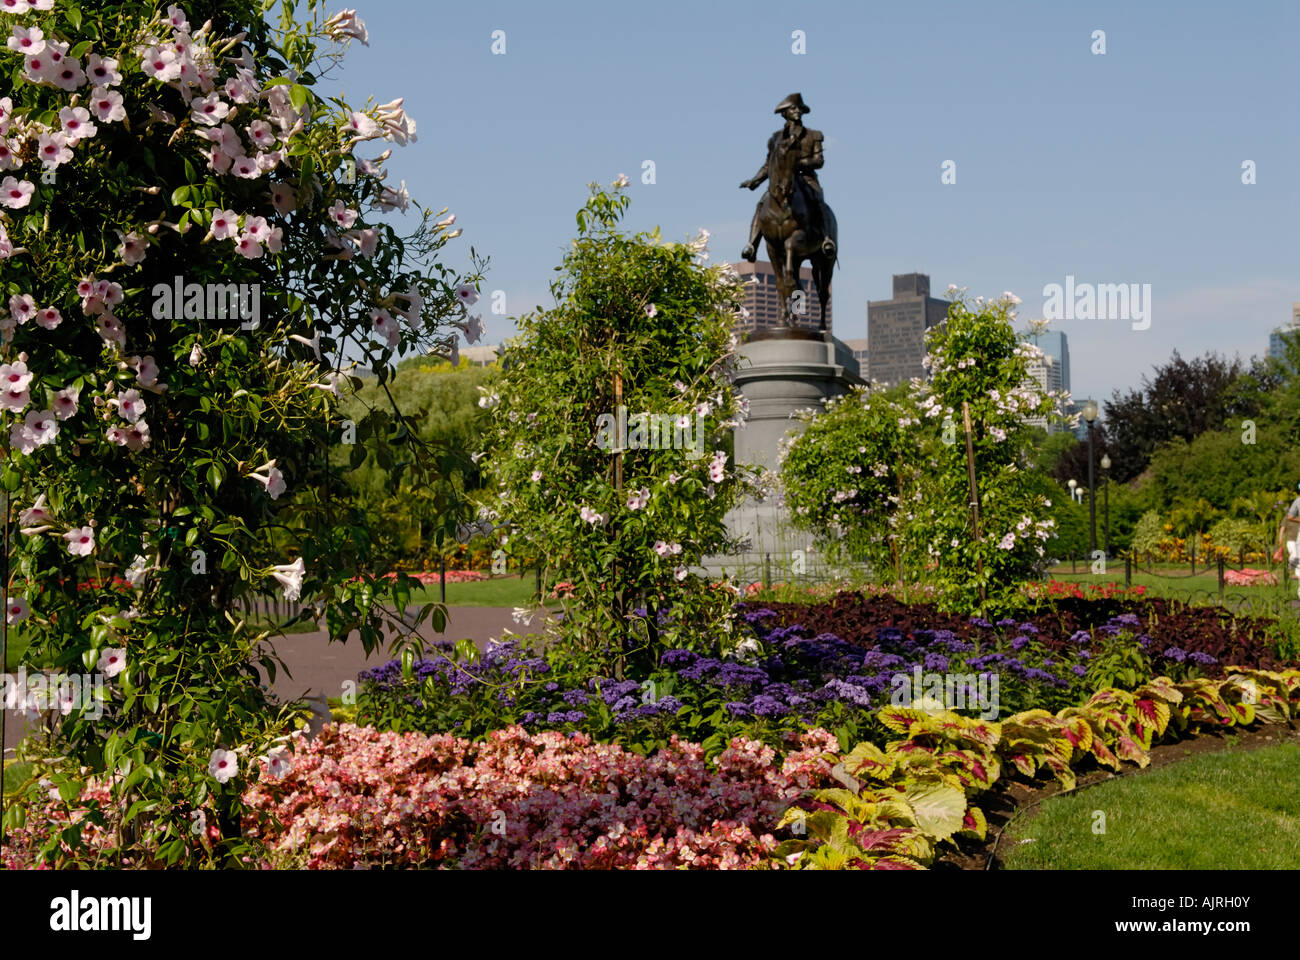 Boston Common Public Gardens - Stock Image